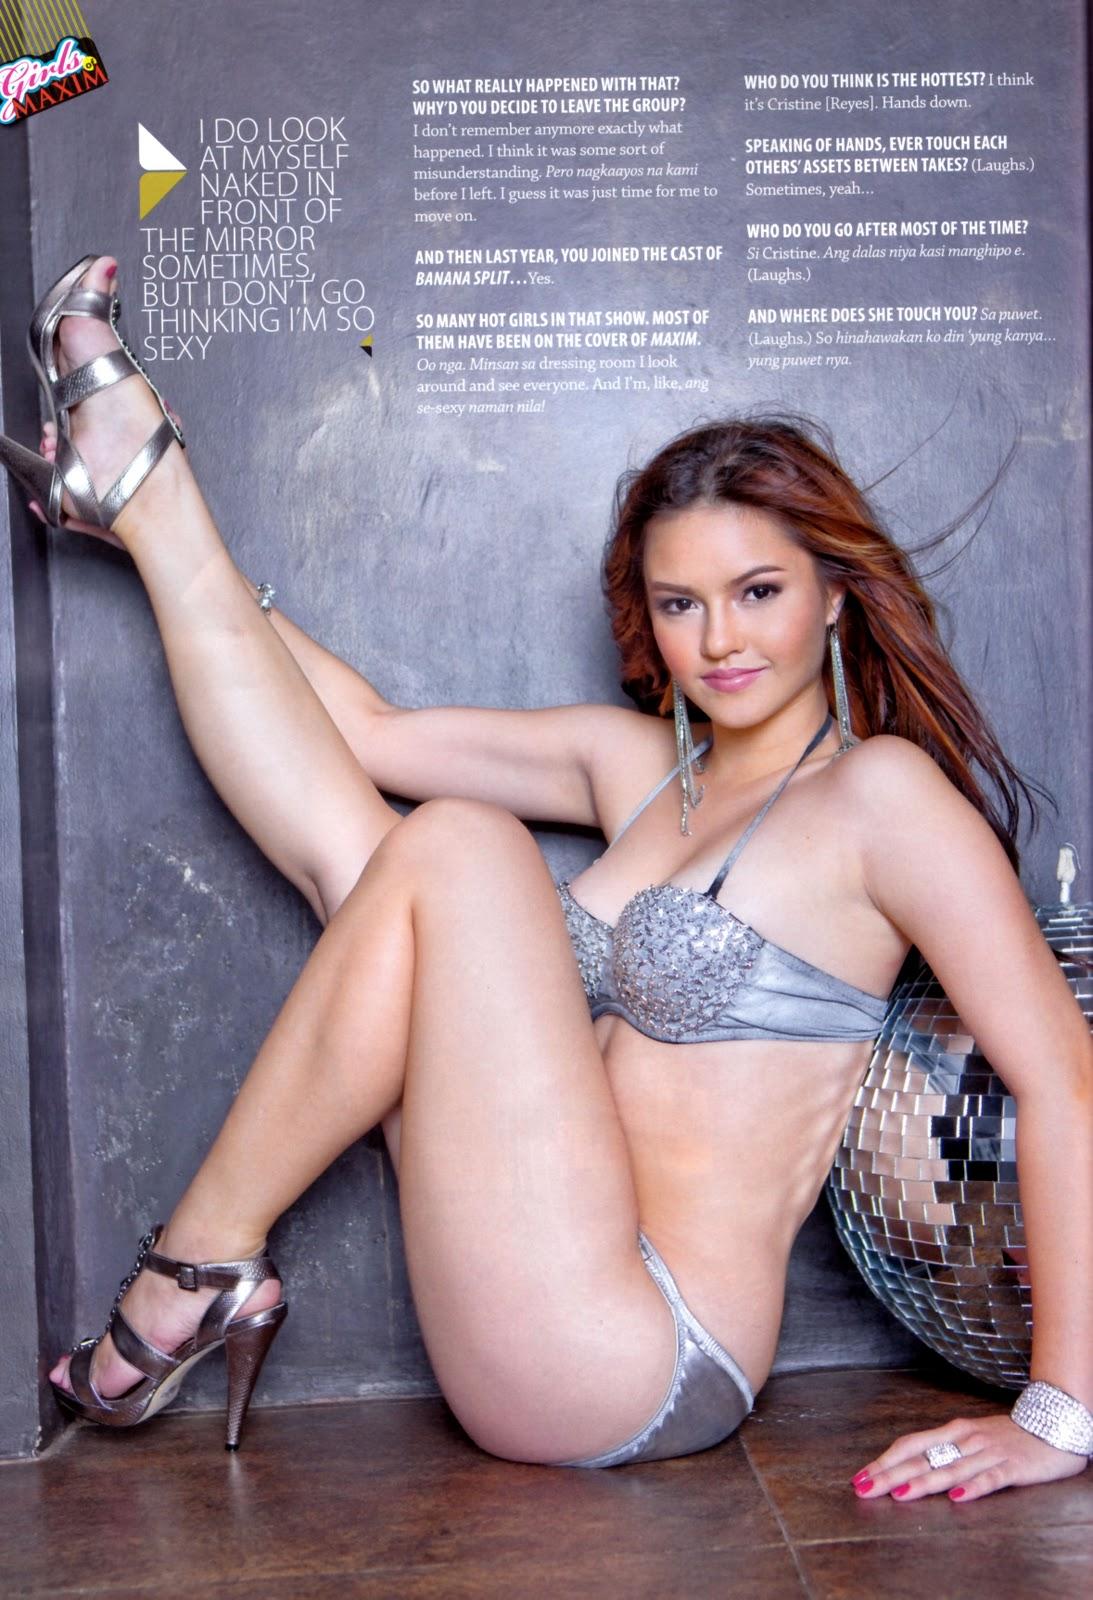 Mocha and jaycee parker girl on girl filipina - 2 part 6